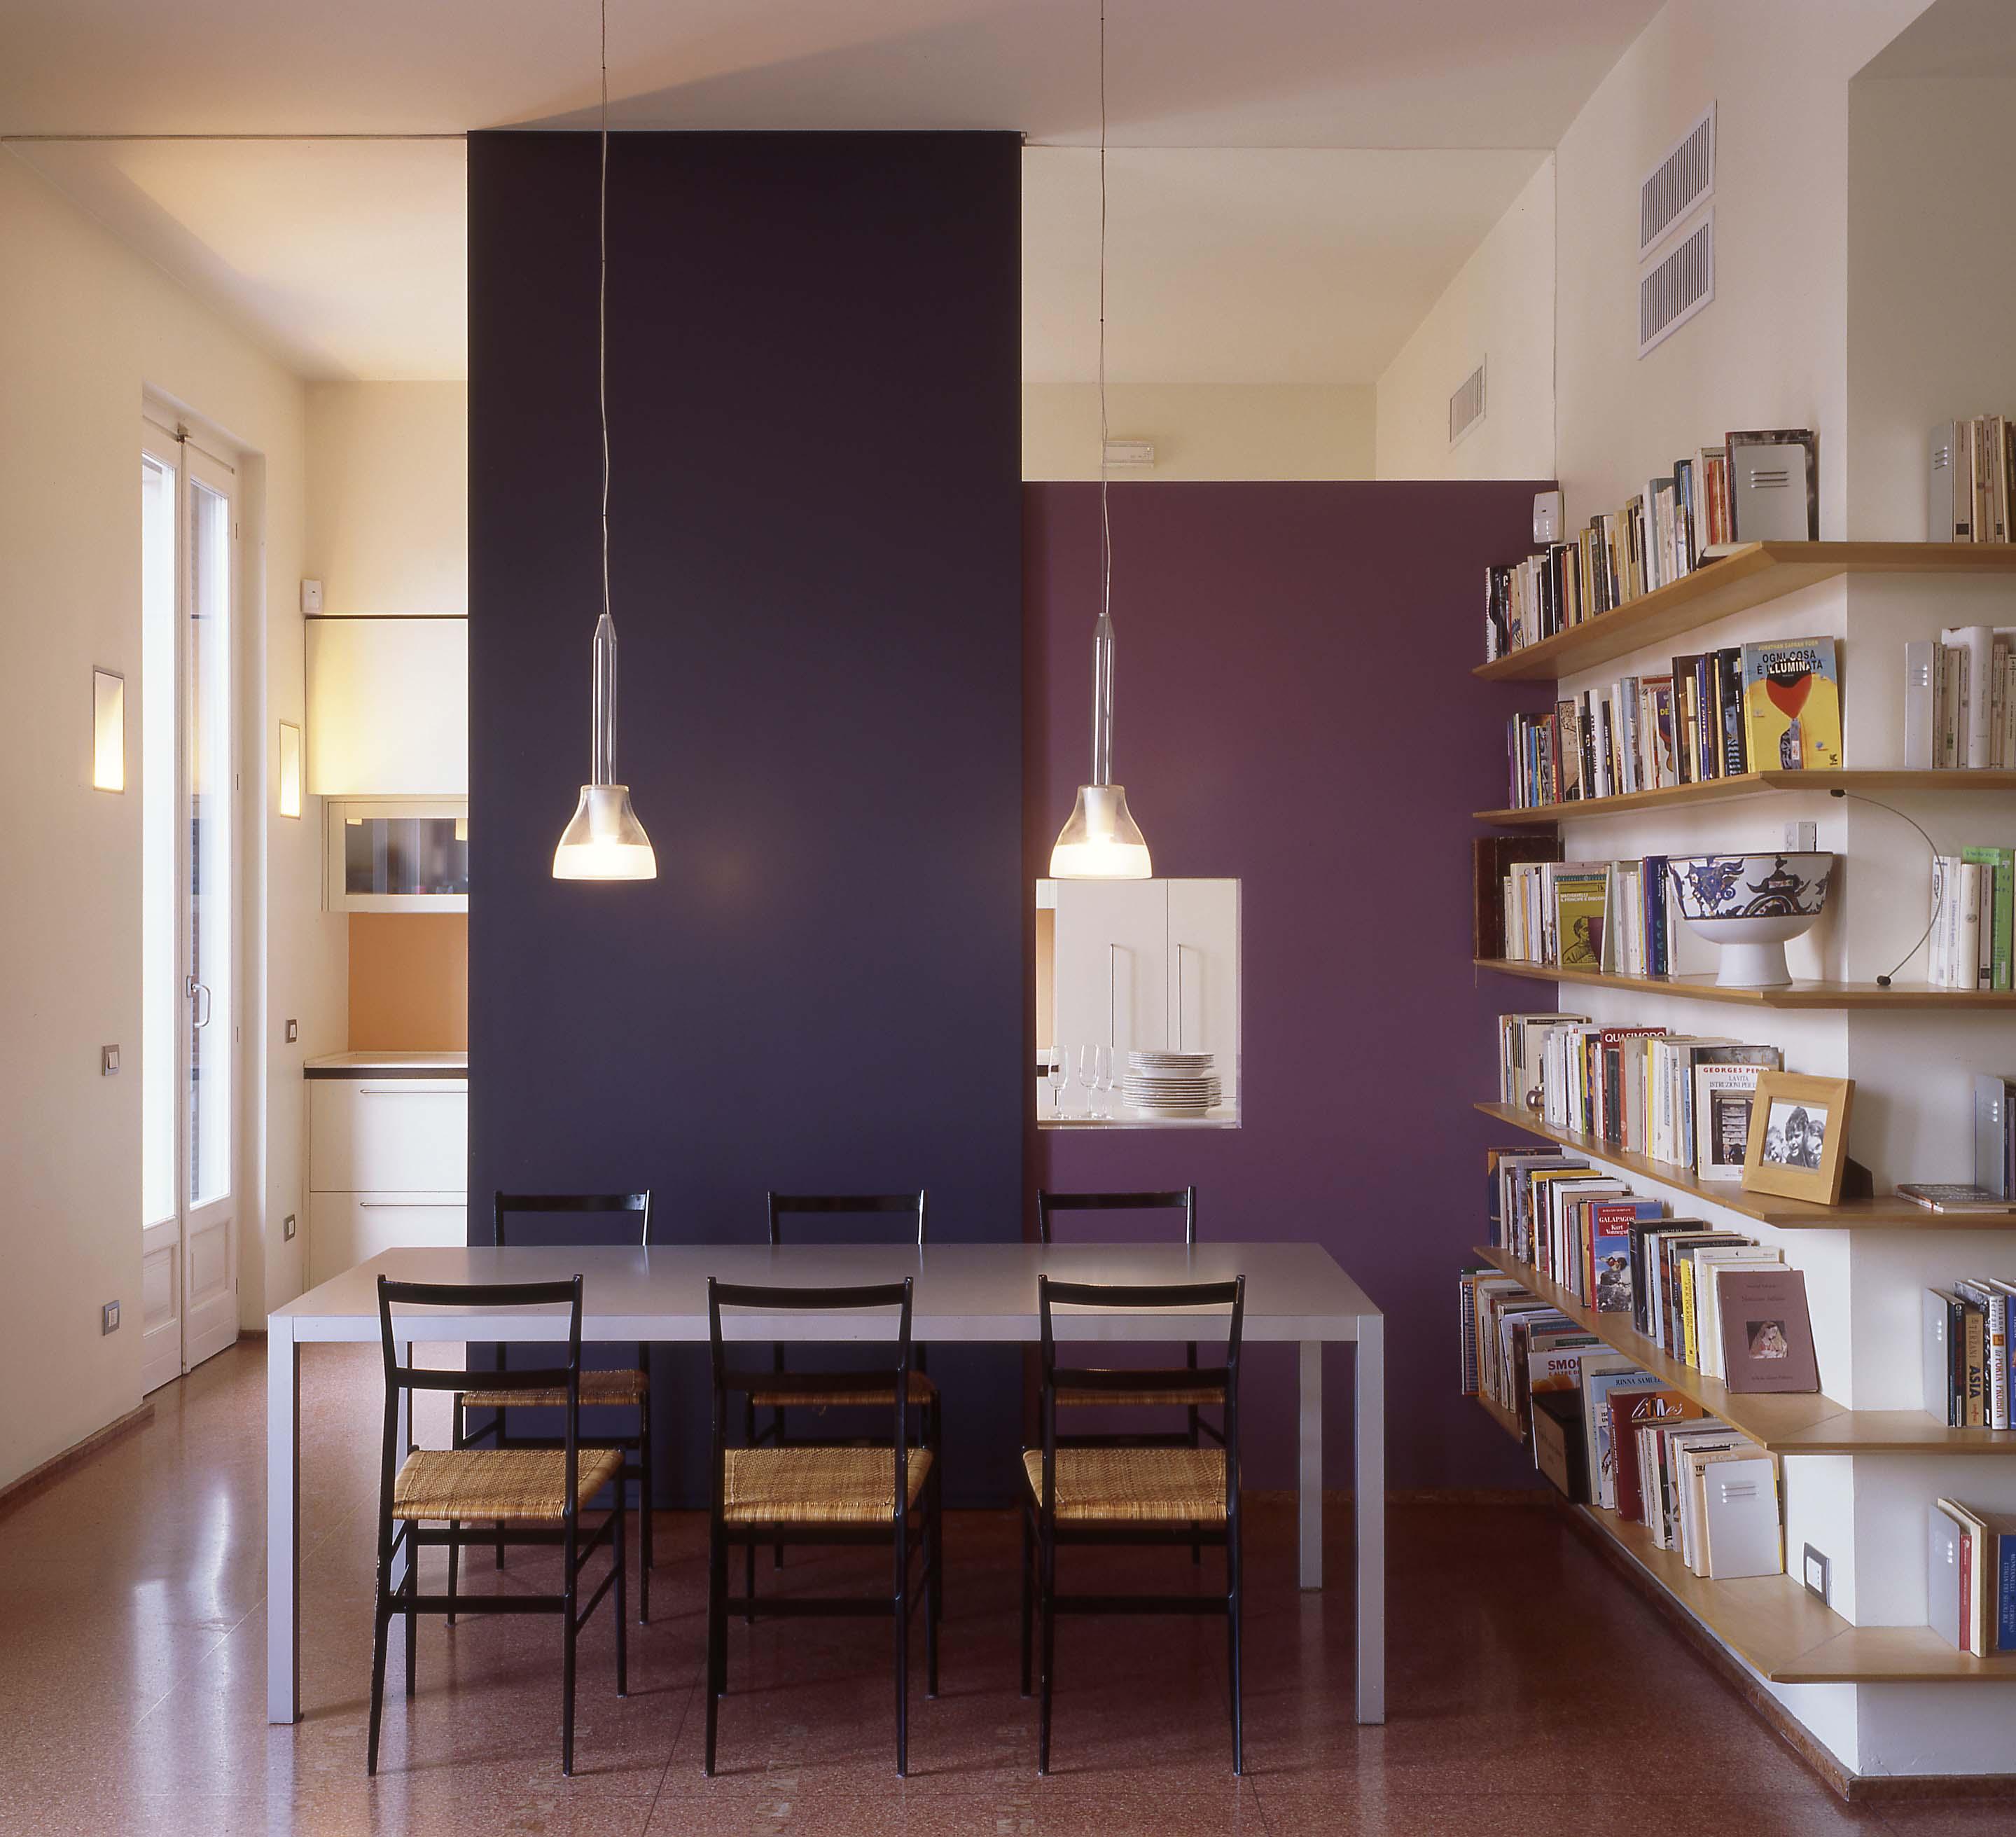 Una favolosa mansarda affacciata su milano - Stanze da pranzo moderne ...